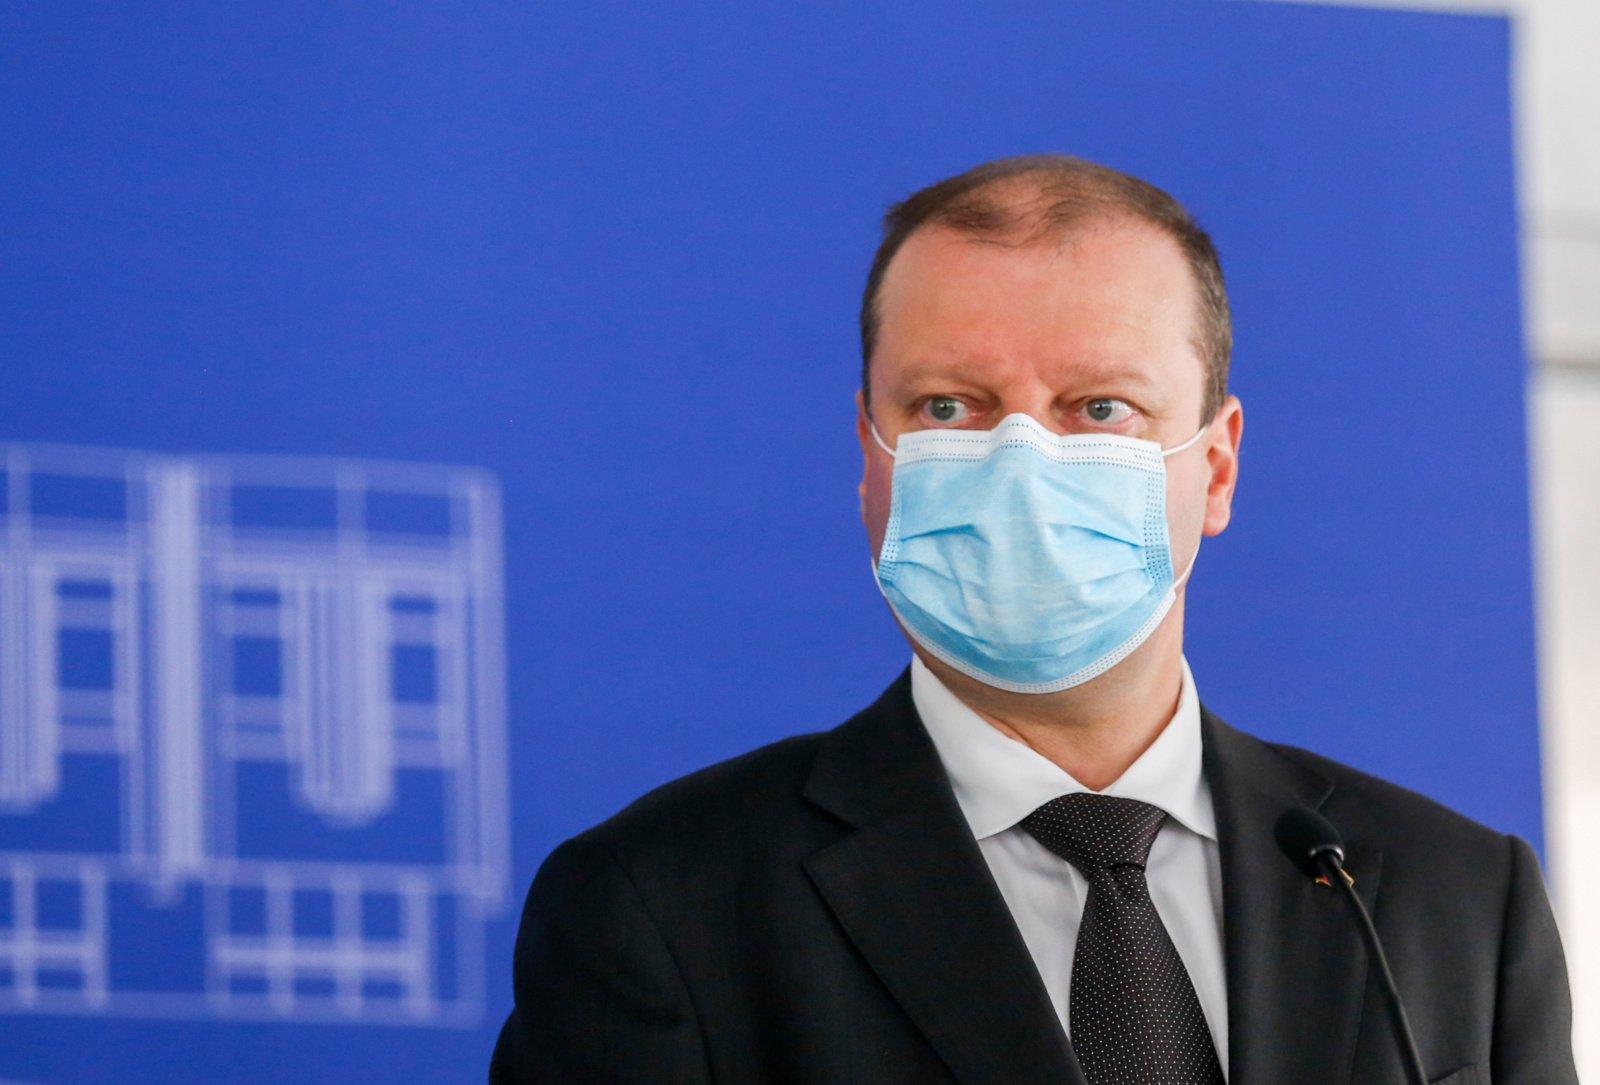 Lietuvos politikai teigia abejojantys nutekinto M. Dworczyko laiško autentiškumu